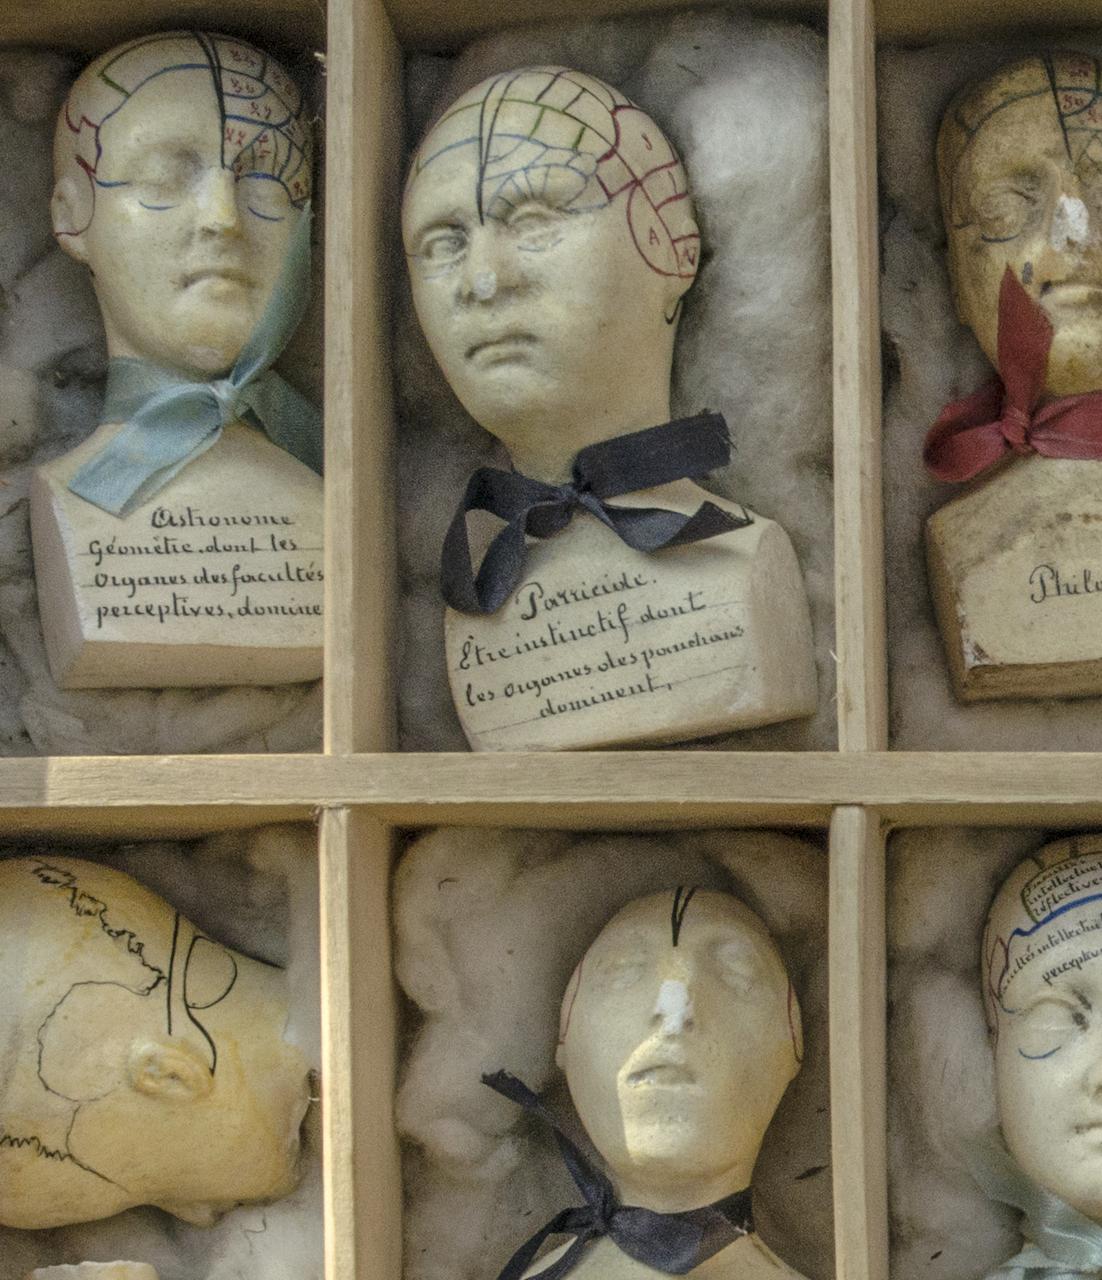 12 Phrenology Busts (France, 19th century), 8 x 4 x 5 cm each (© Rosamond Purcell, 2014)